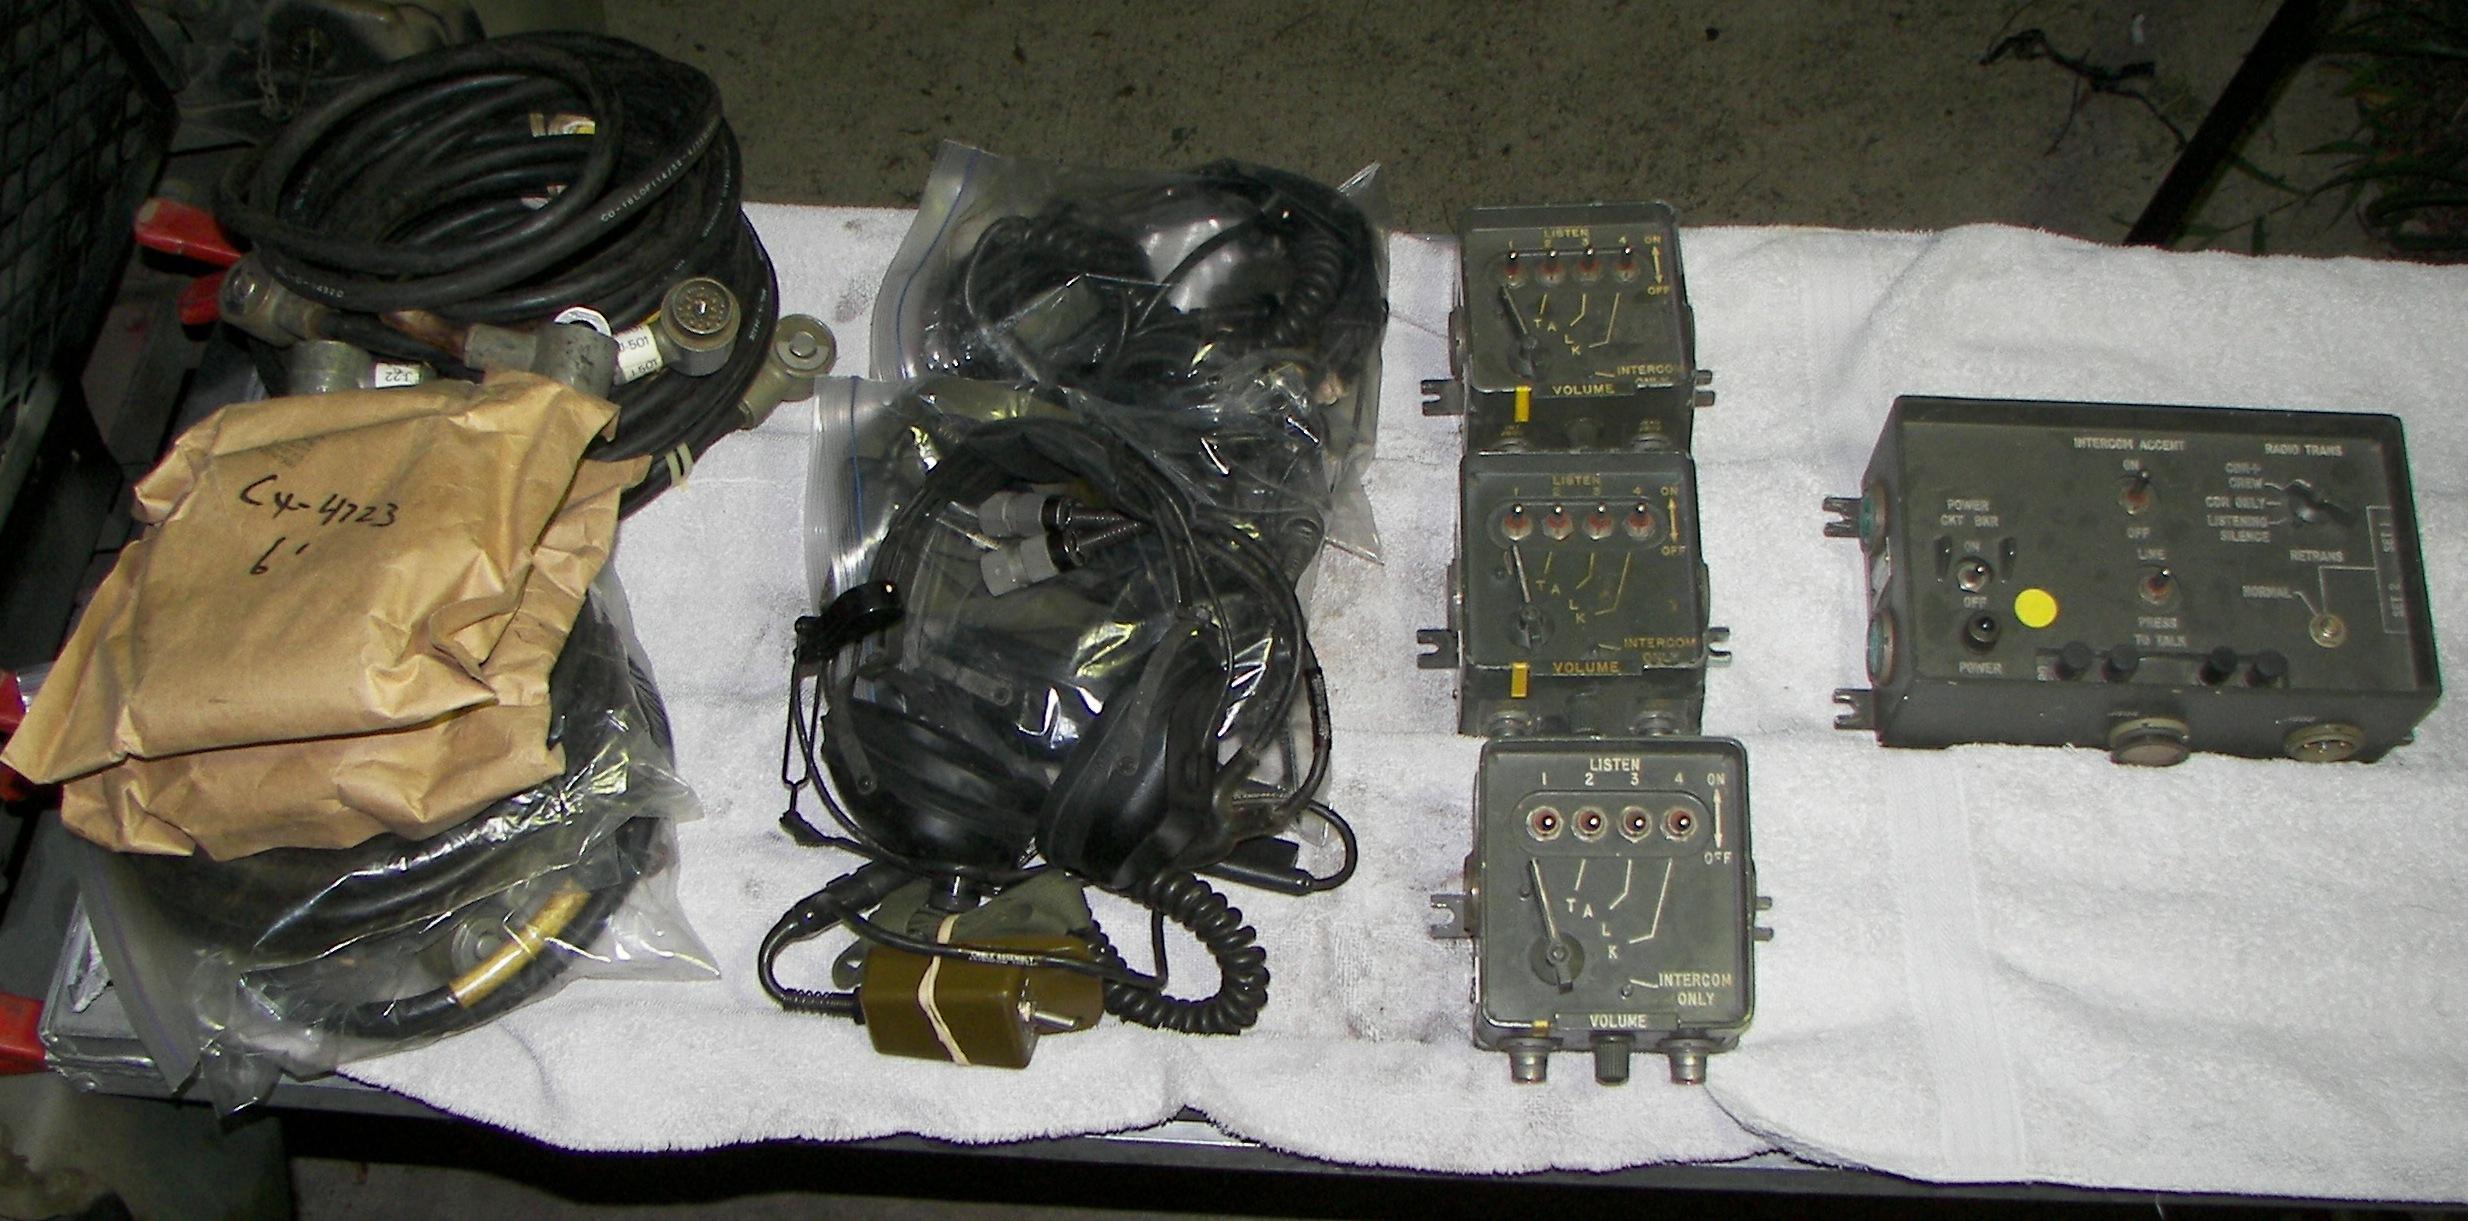 power flame wiring diagram 2004 subaru impreza radio installing aux. 24v and 12v an an/vic-4 intercom in m35 military truck